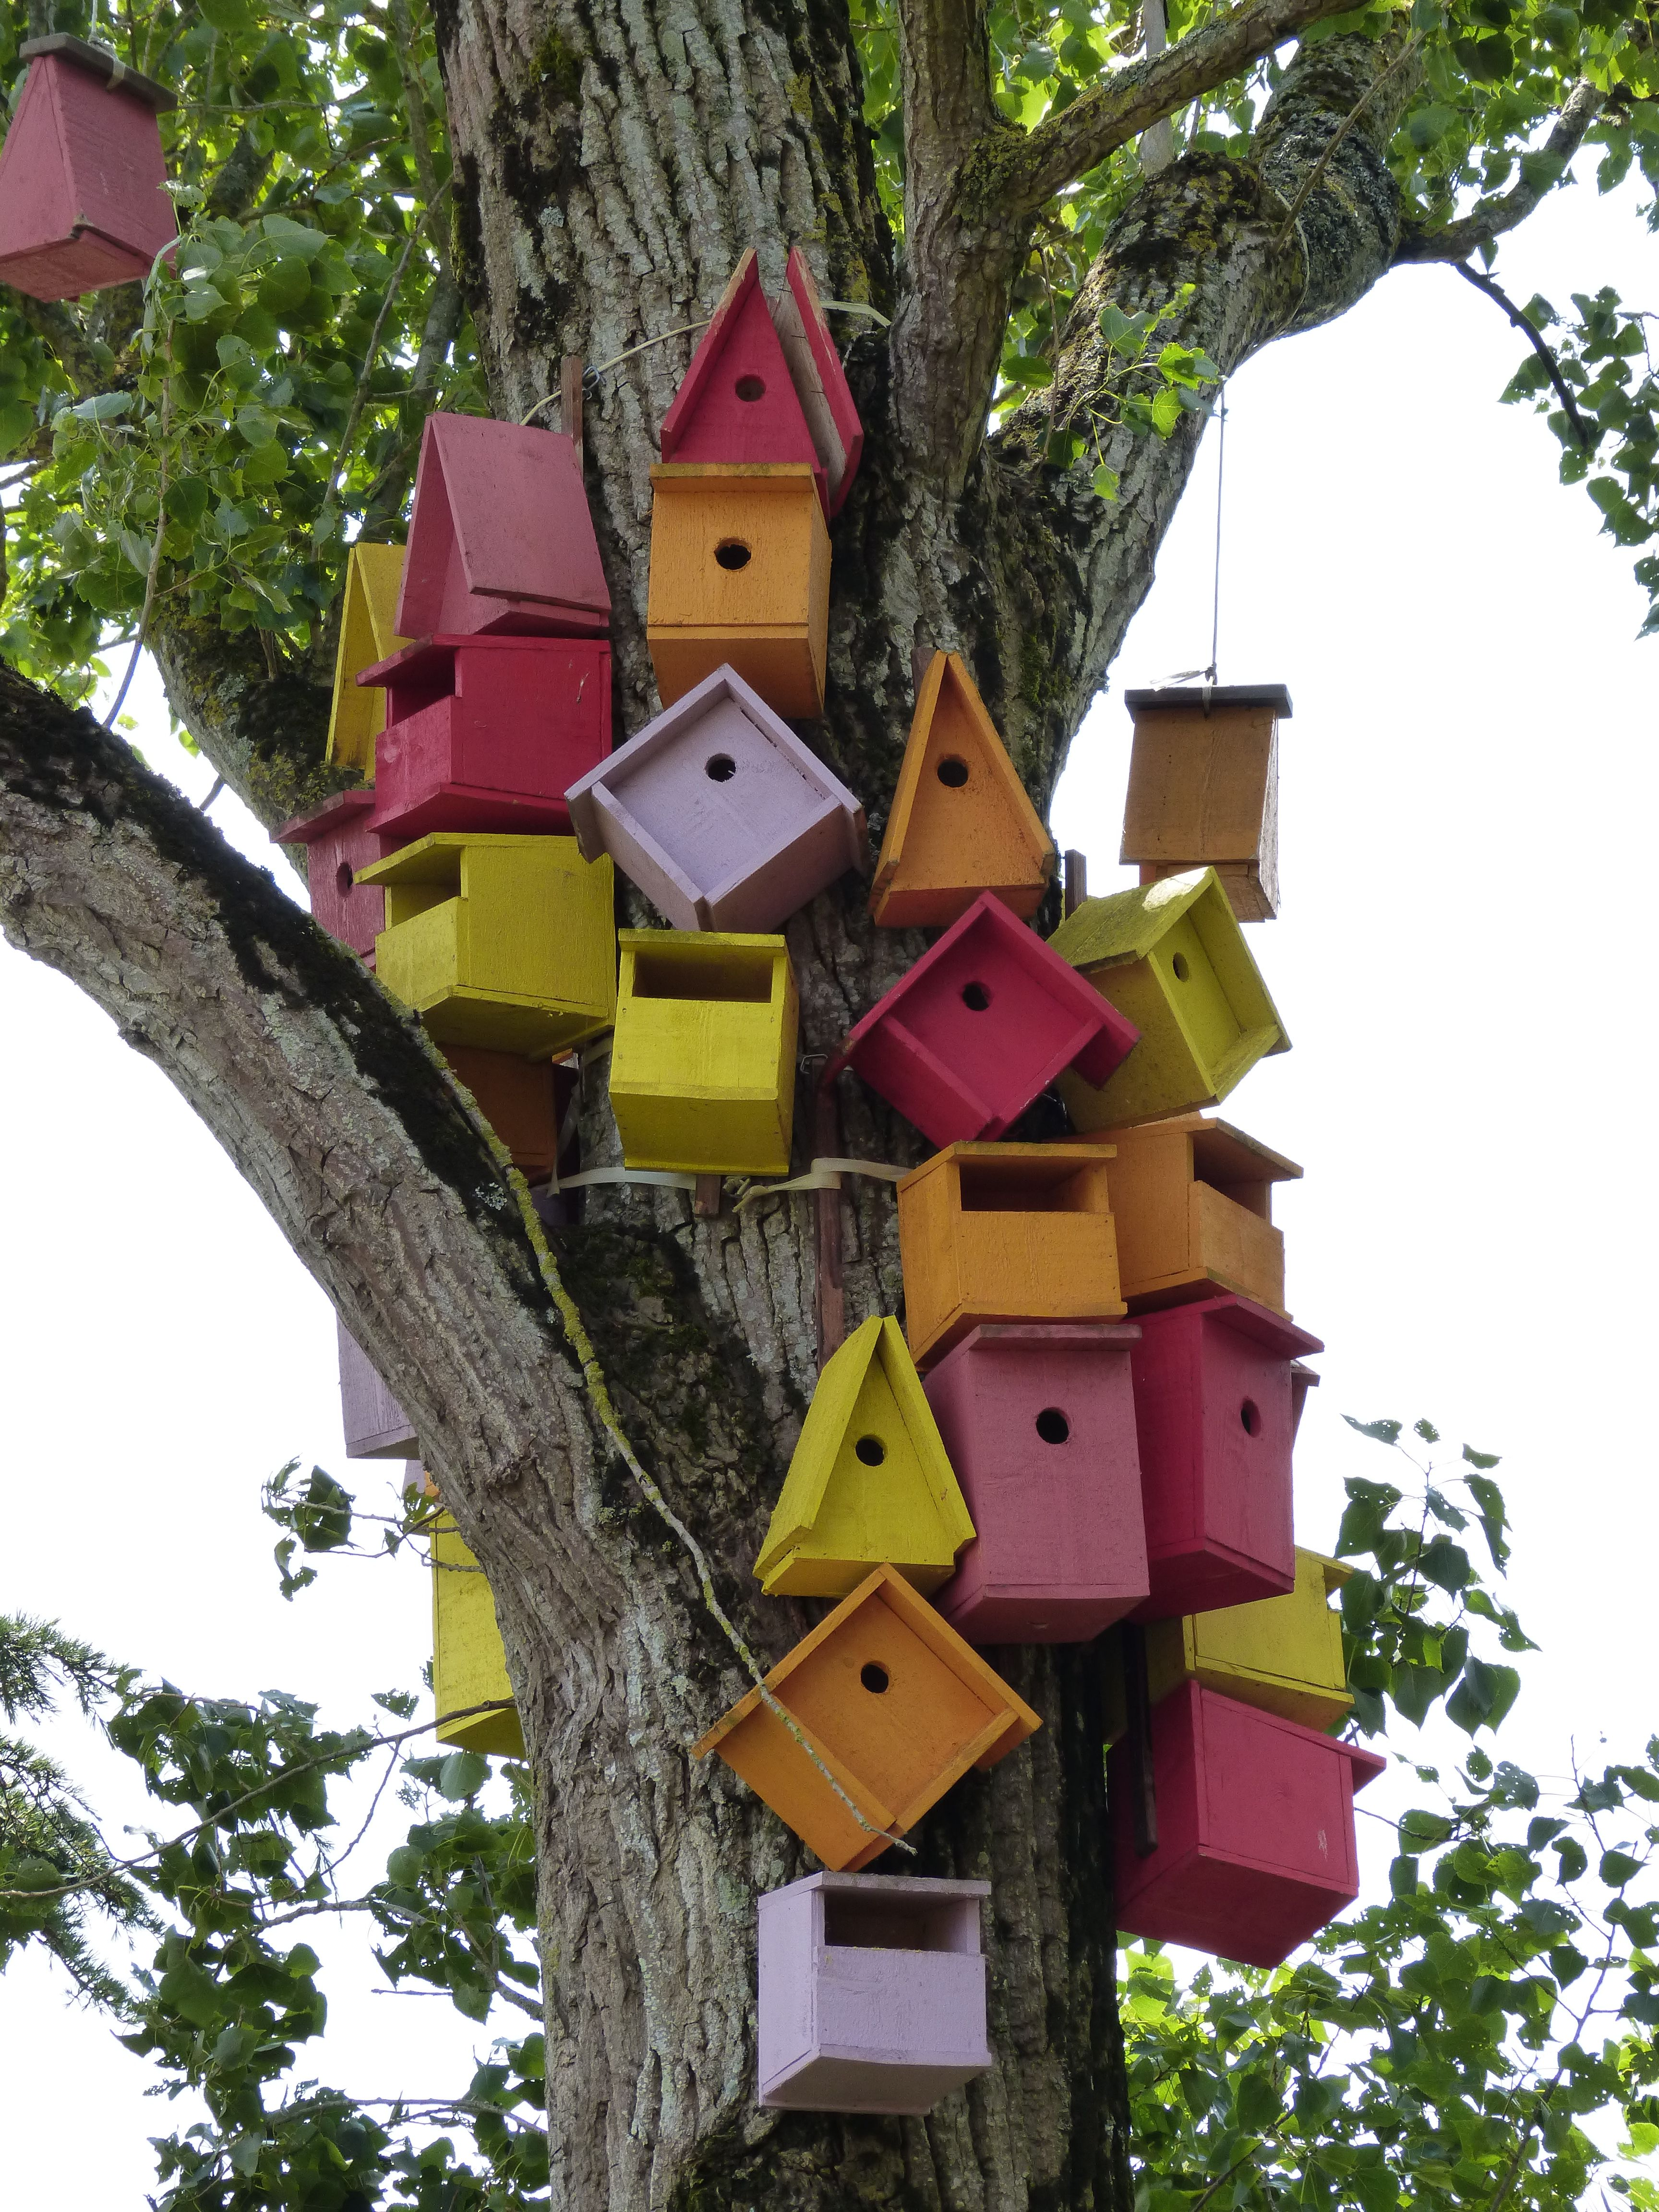 nichoirs Bird houses, Outdoor decor, Bird house